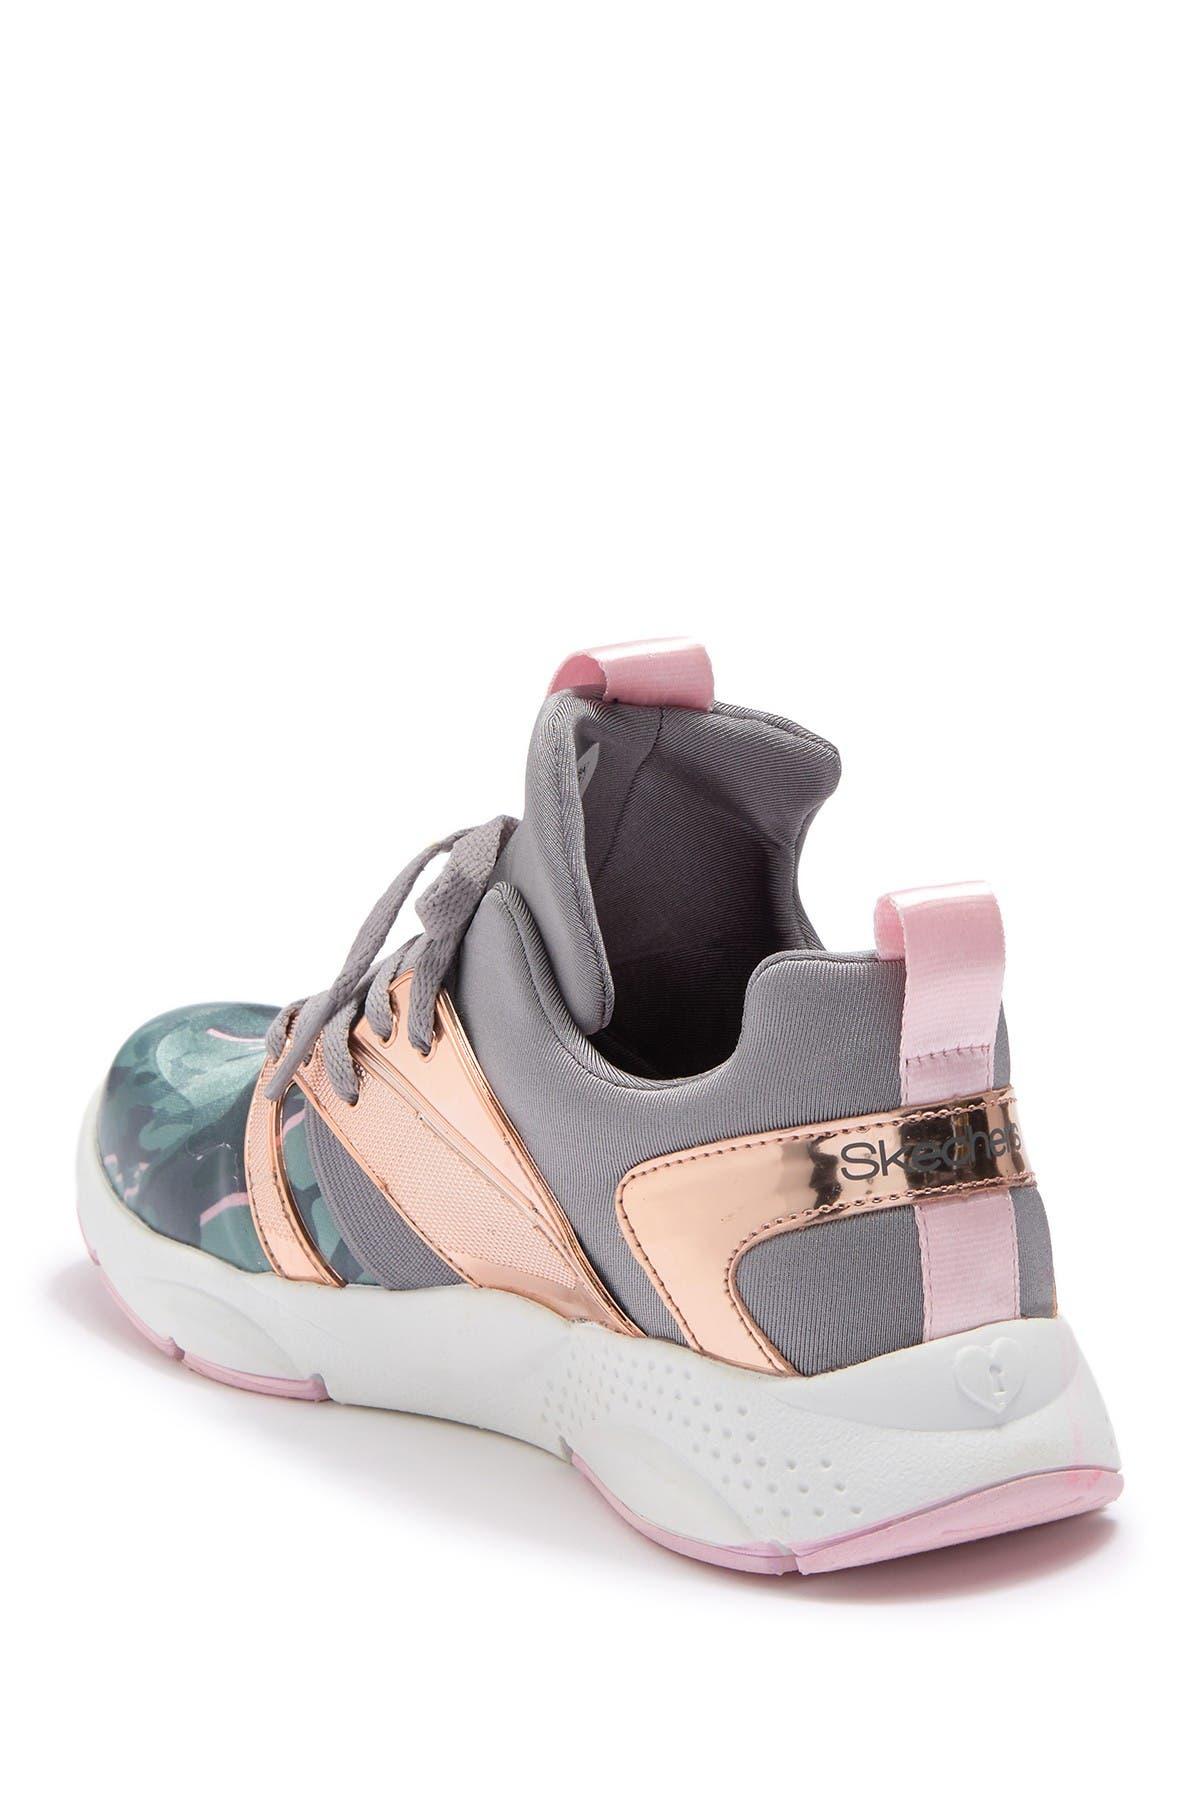 Image of Skechers Shine Status Sneakers